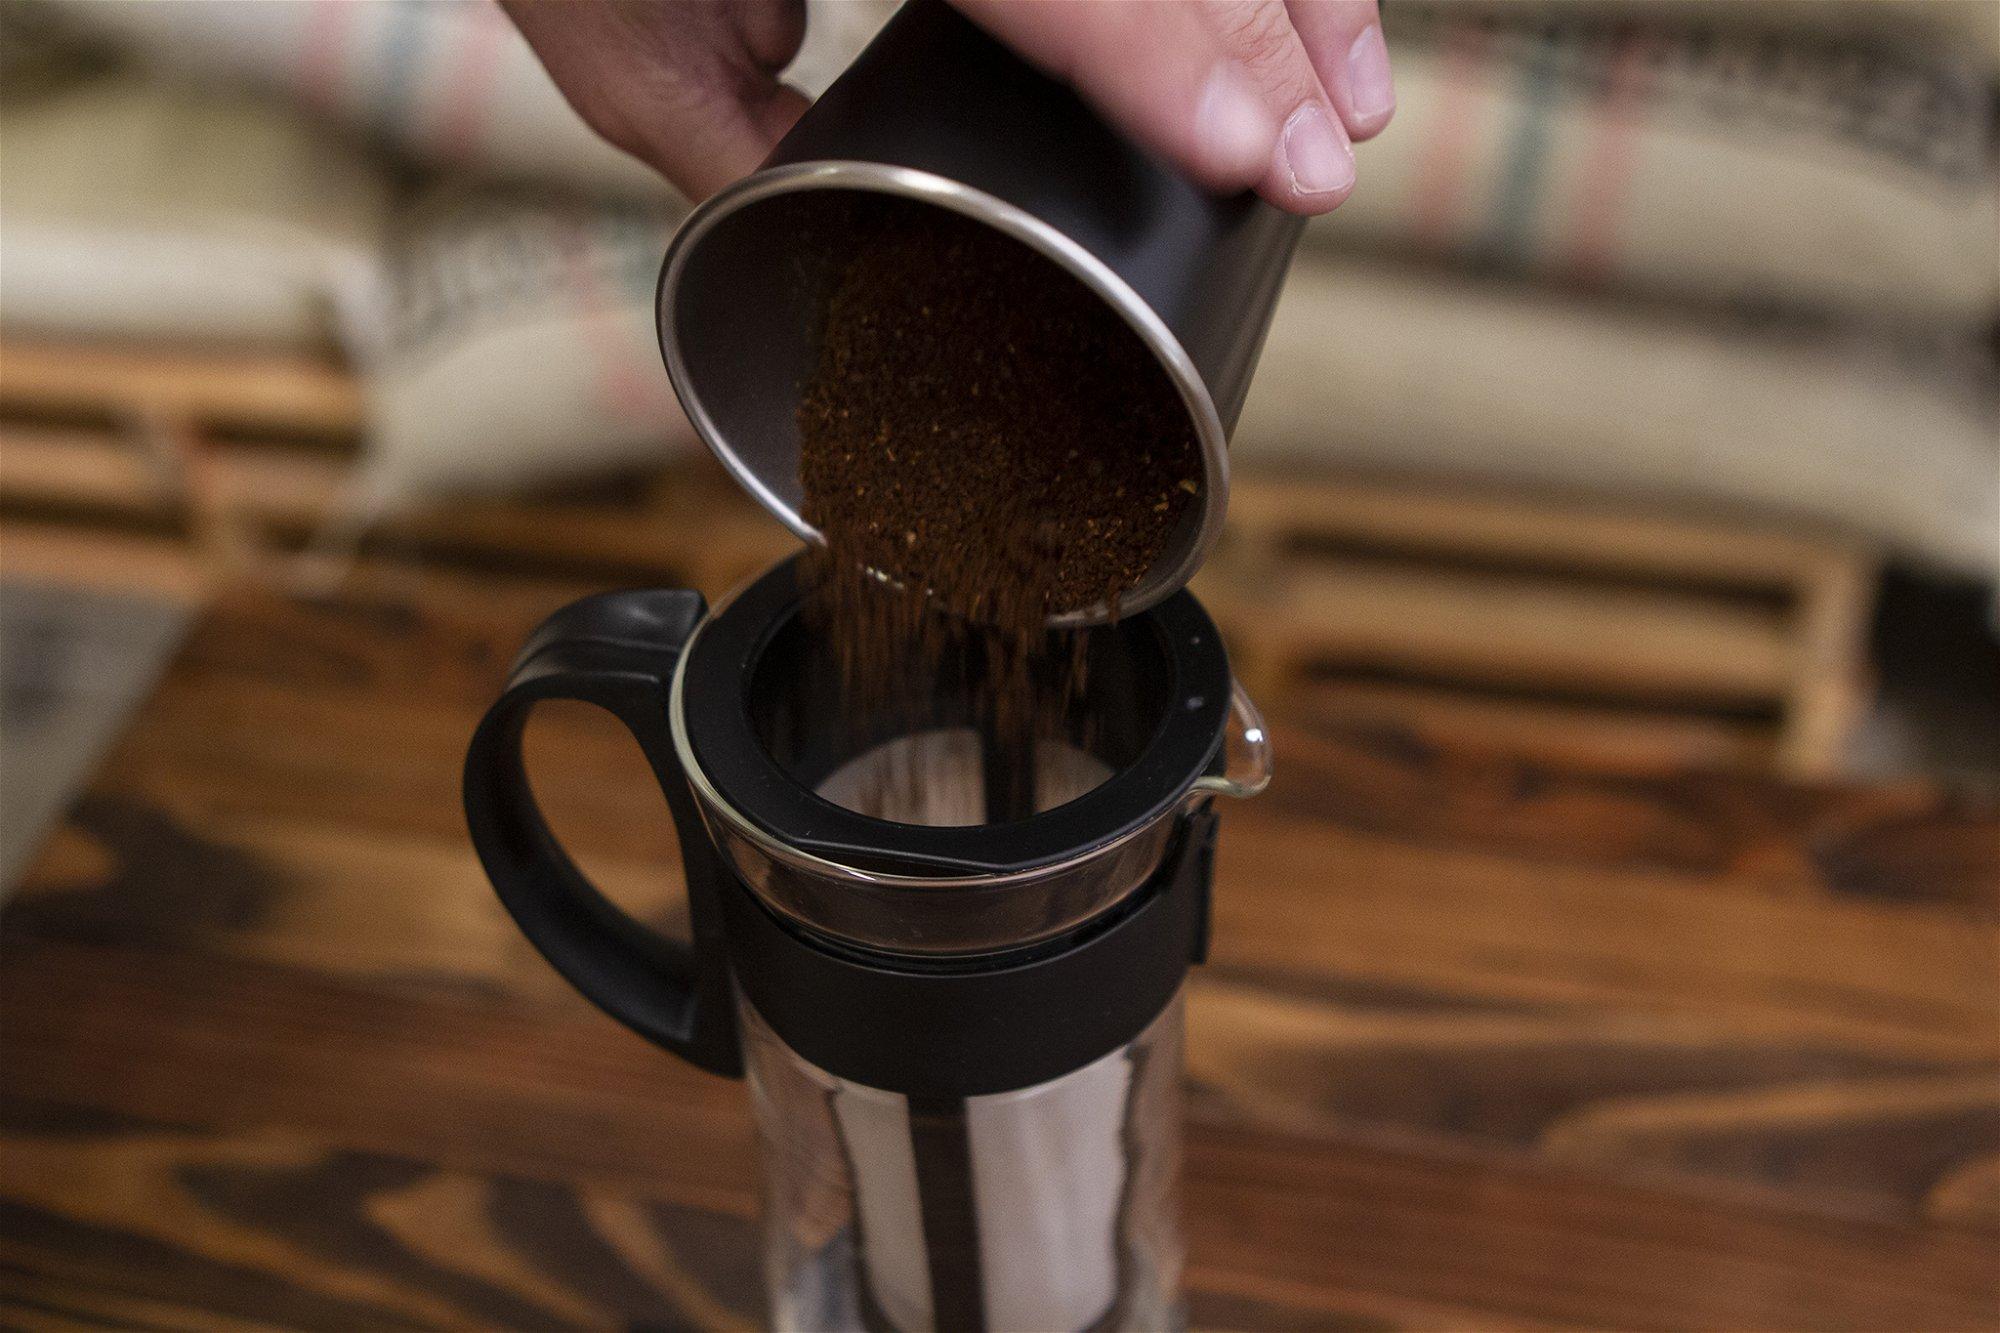 ADDING GROUND COFFEE TO HARIO MIZUDASHI COLD BREWER